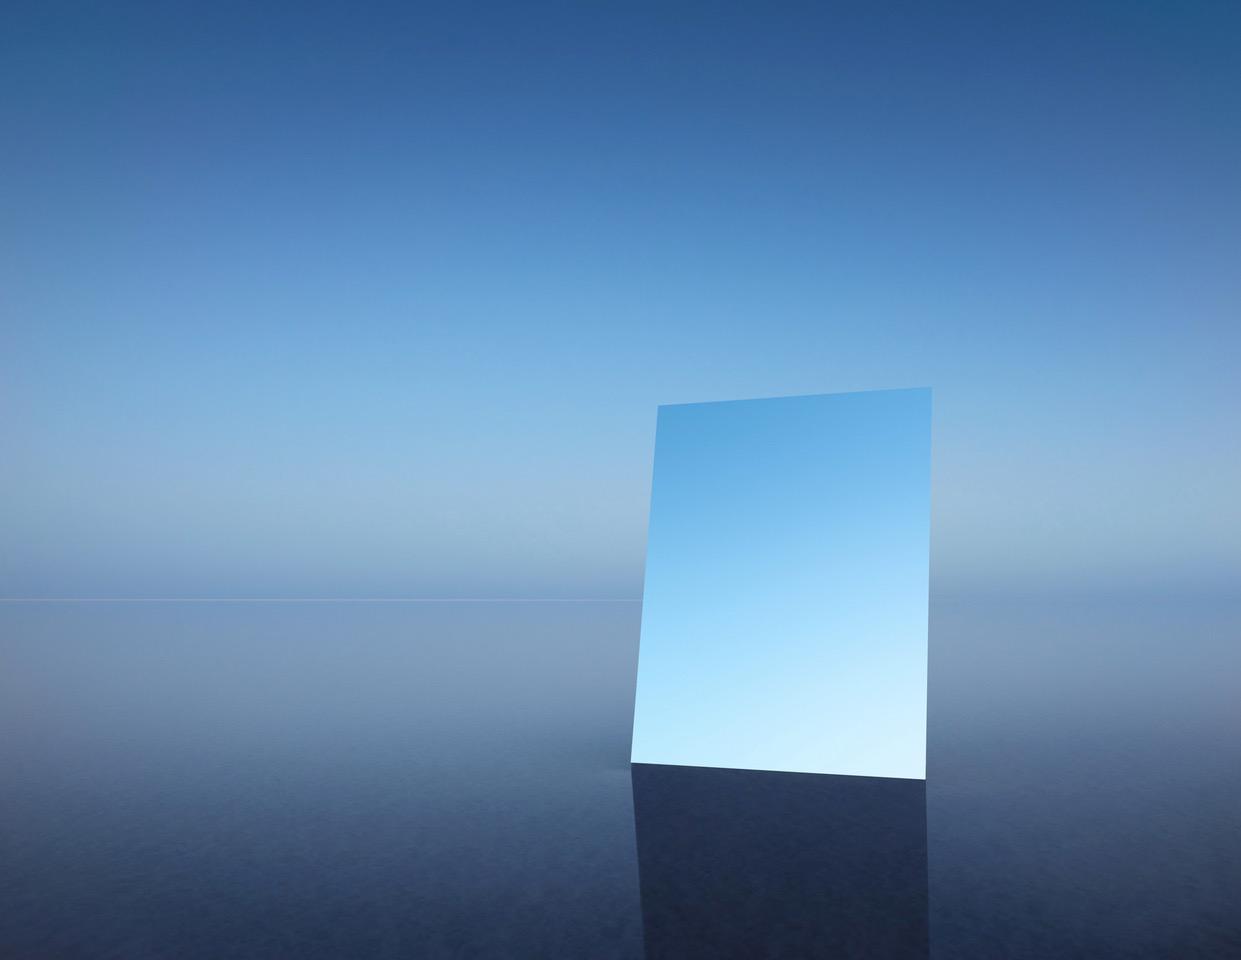 MURRAY FREDERICKS   Mirror 14  2017 Digital pigment print on cotton rag 120 x 155 cm